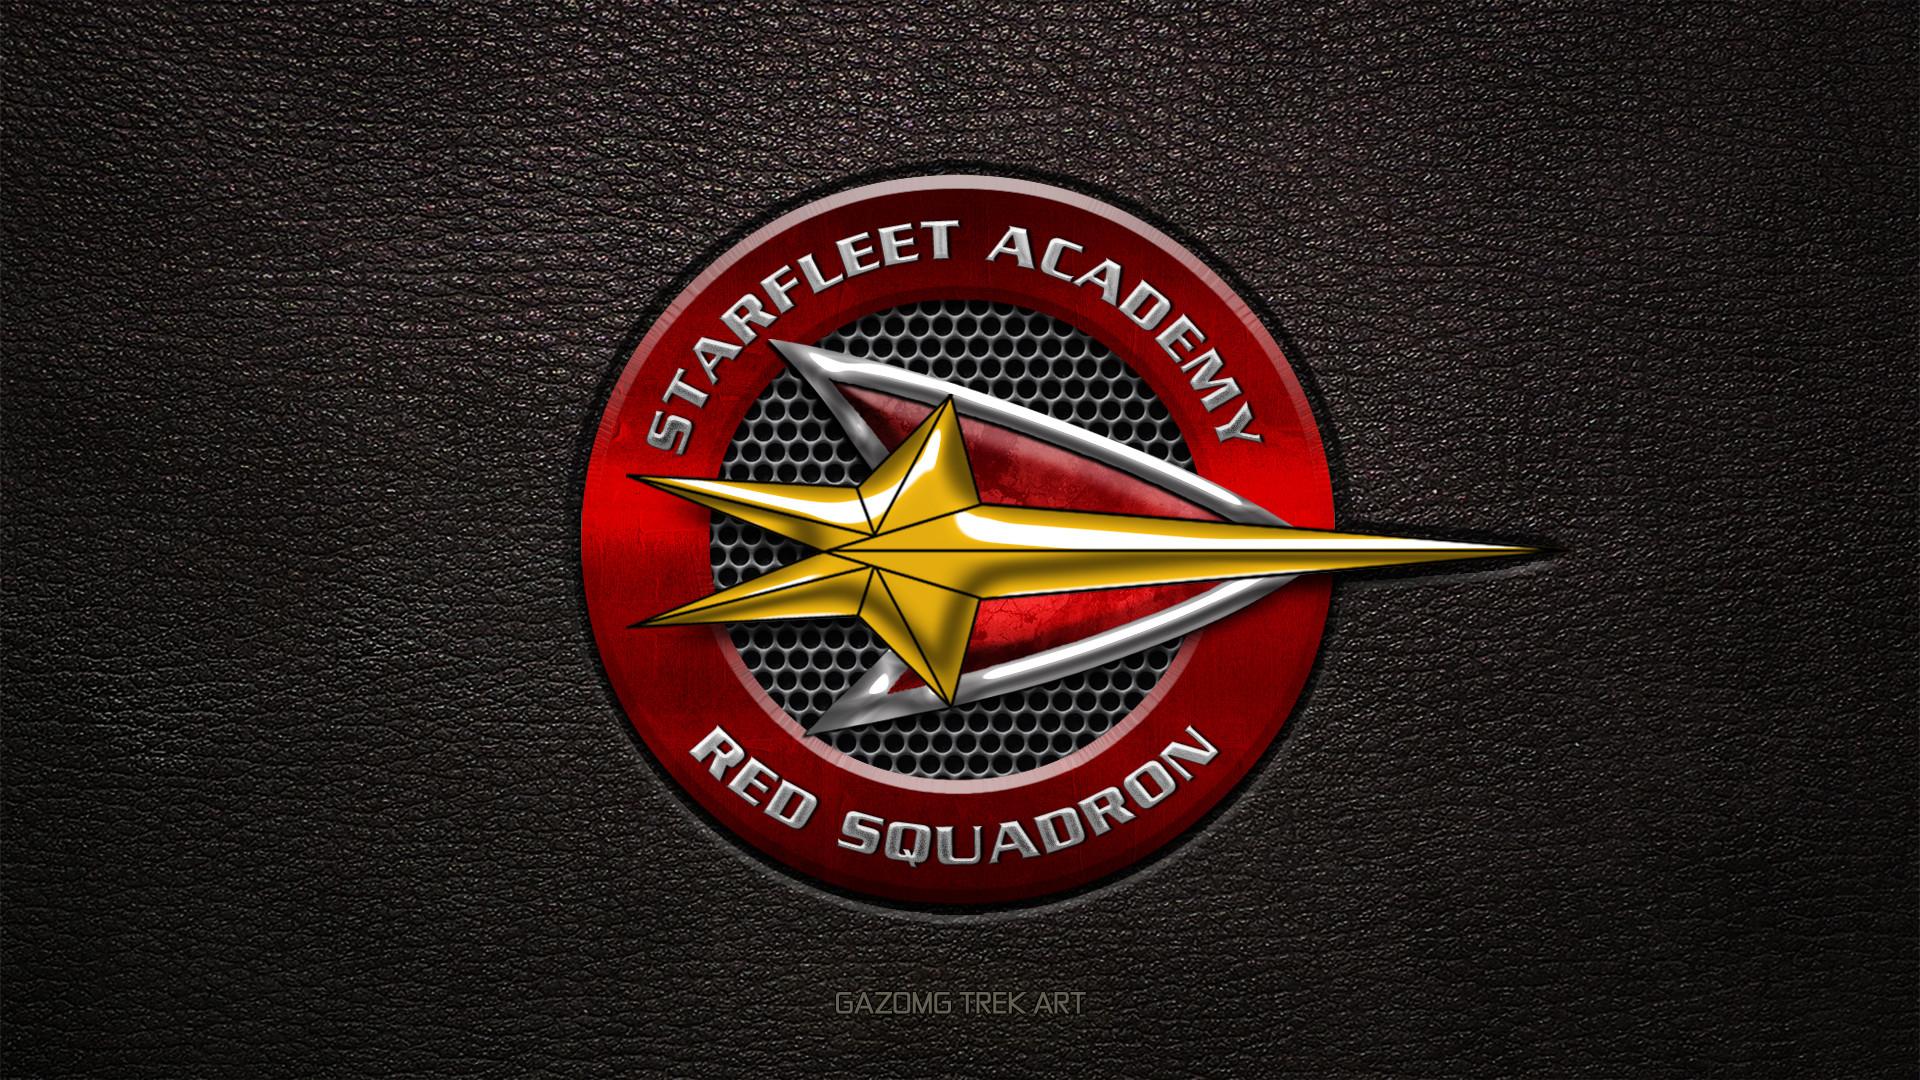 … Starfleet Academy Red Squad Star Trek Logo Updated by gazomg